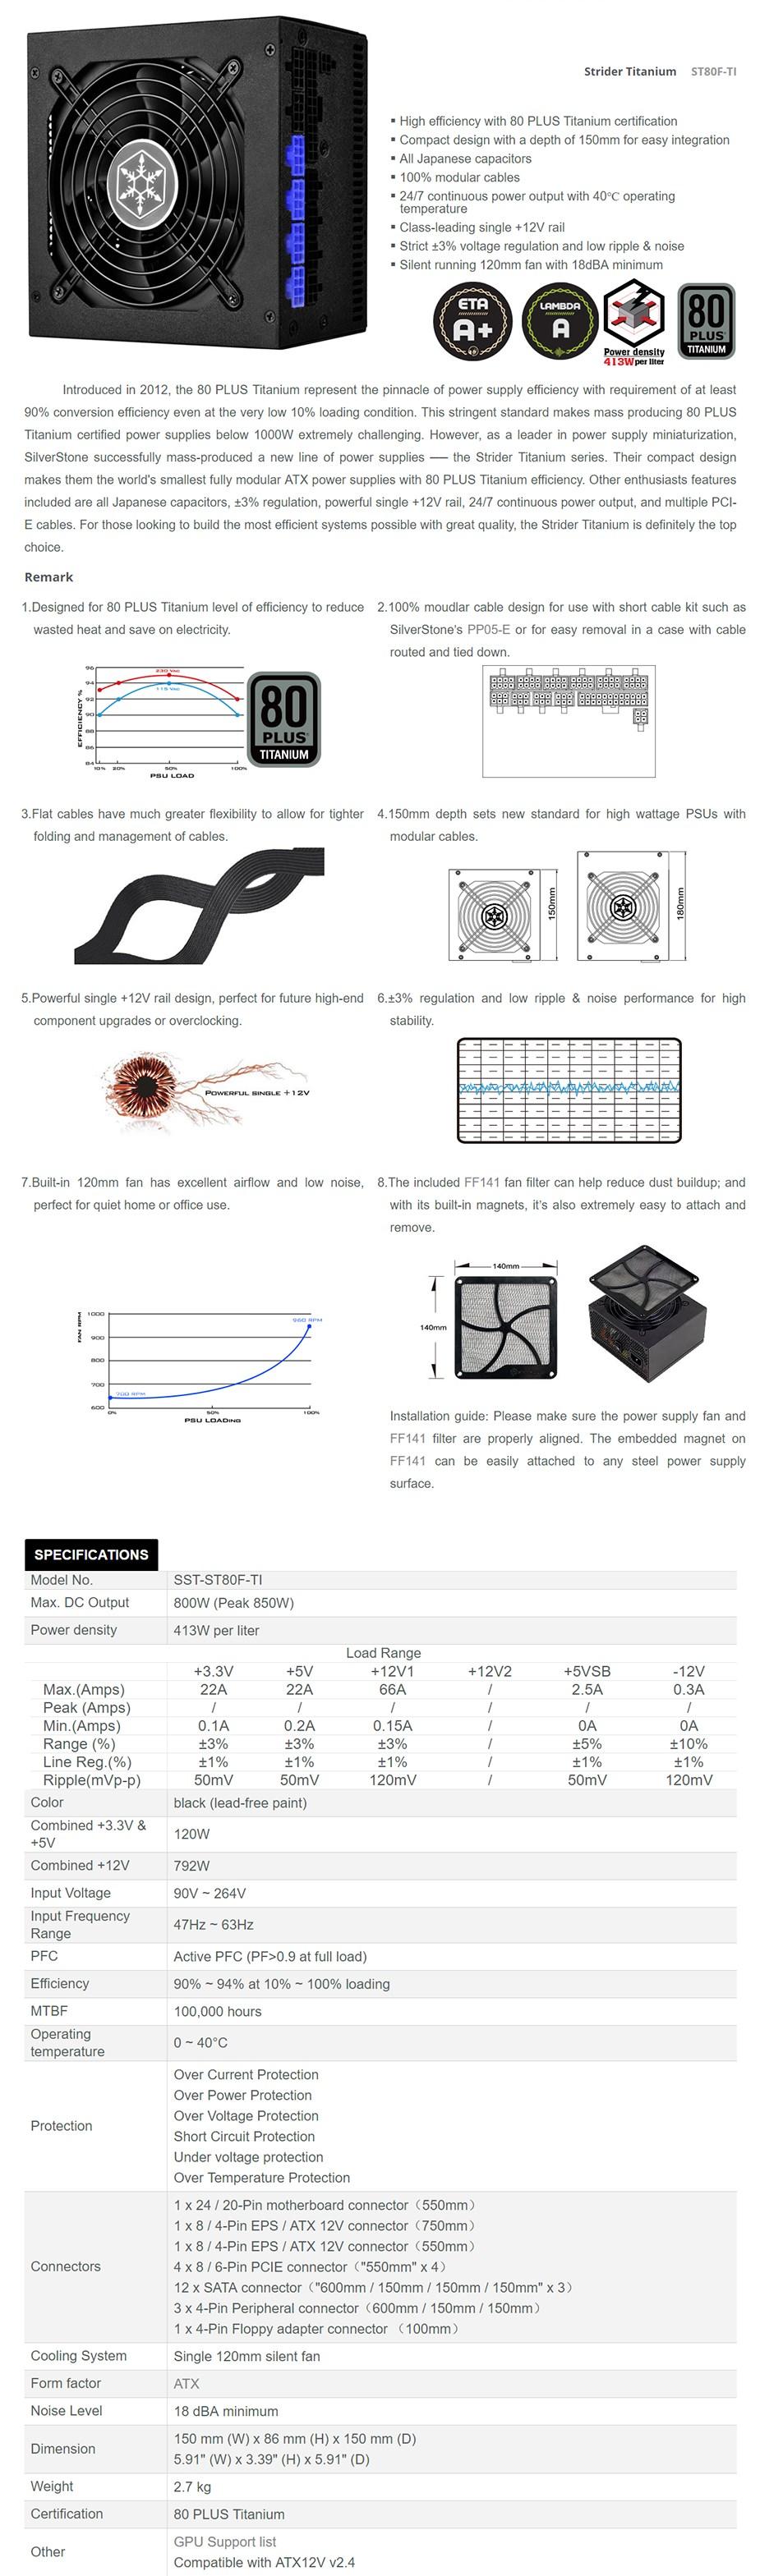 SilverStone Strider Titanium ST80F-TI 800W 80 PLUS Titanium Modular Power Supply - Desktop